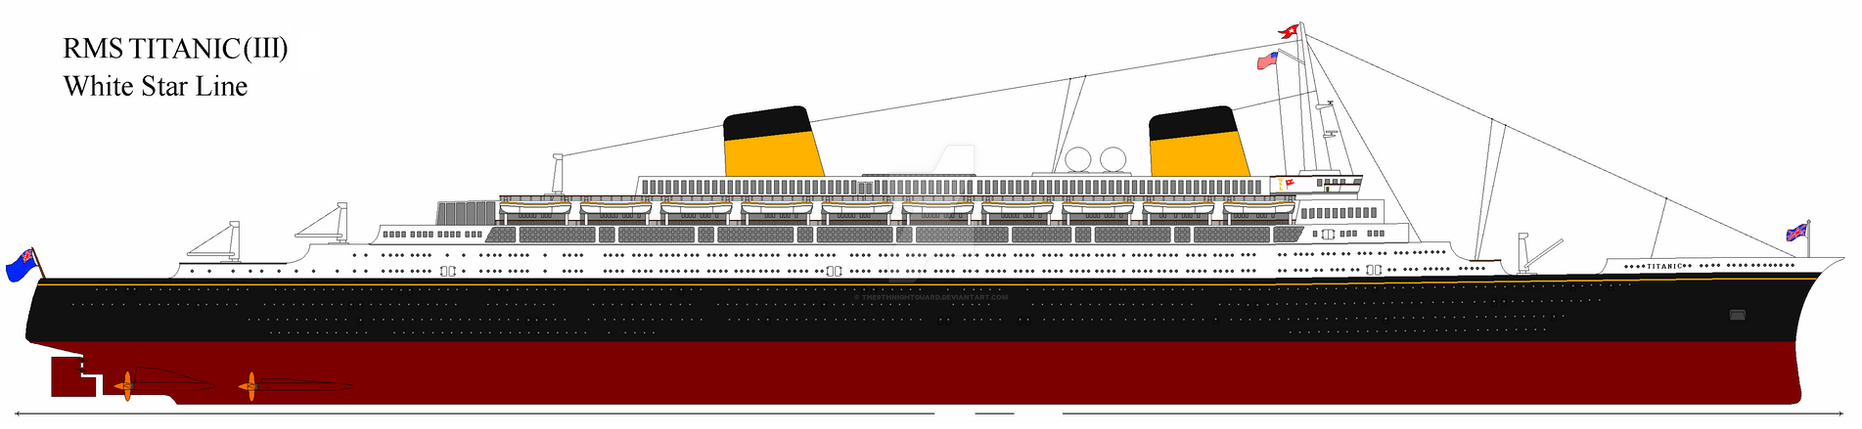 RMS Titanic (III) (1975 AU) by p51cmustang